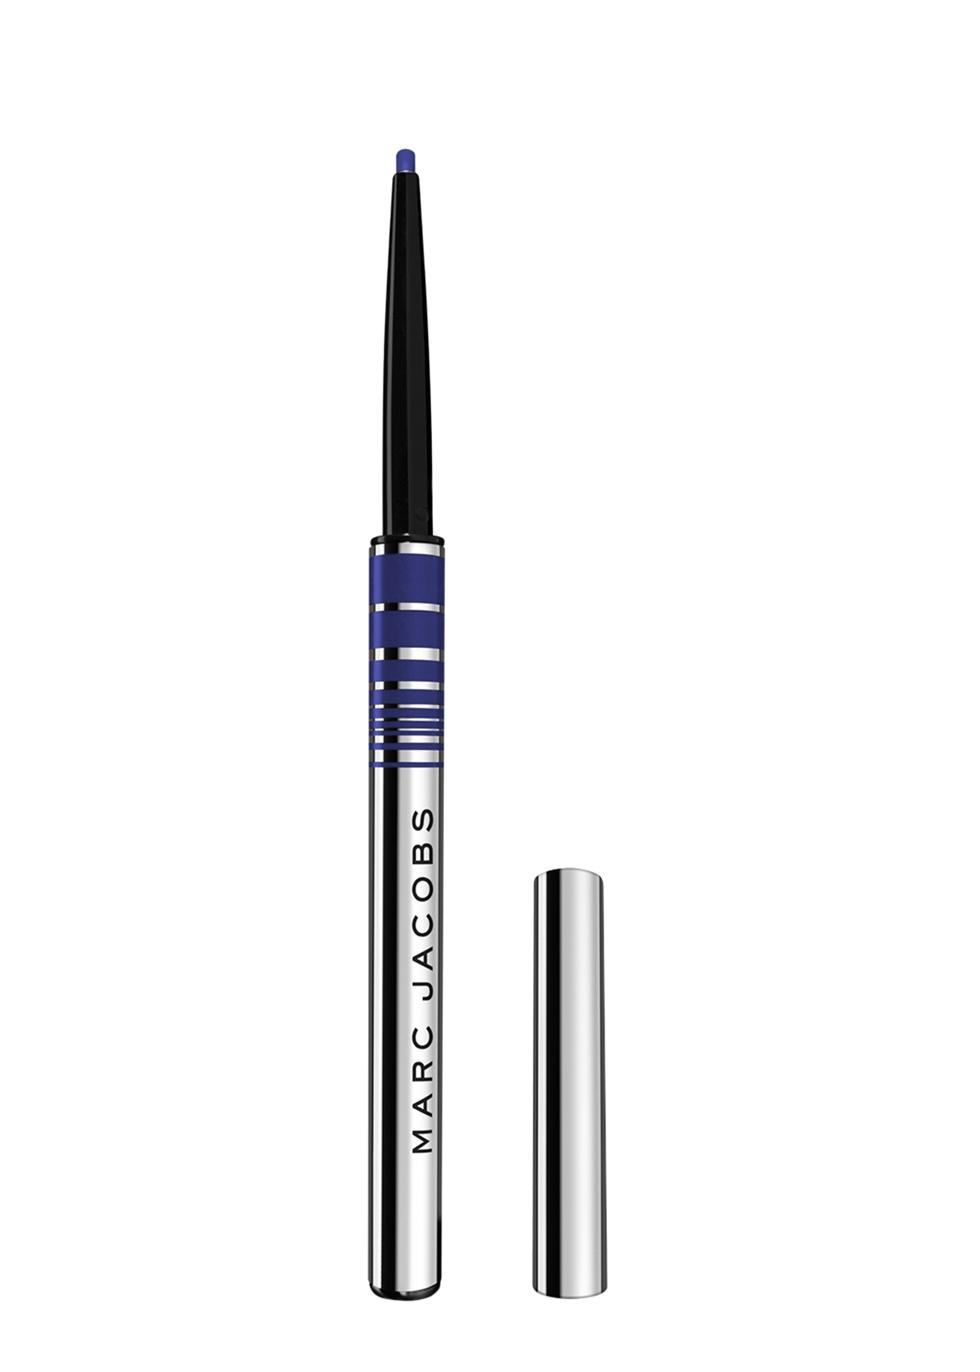 Fineliner Ultra-Skinny Gel Eye Crayon Eyeliner - MARC JACOBS BEAUTY